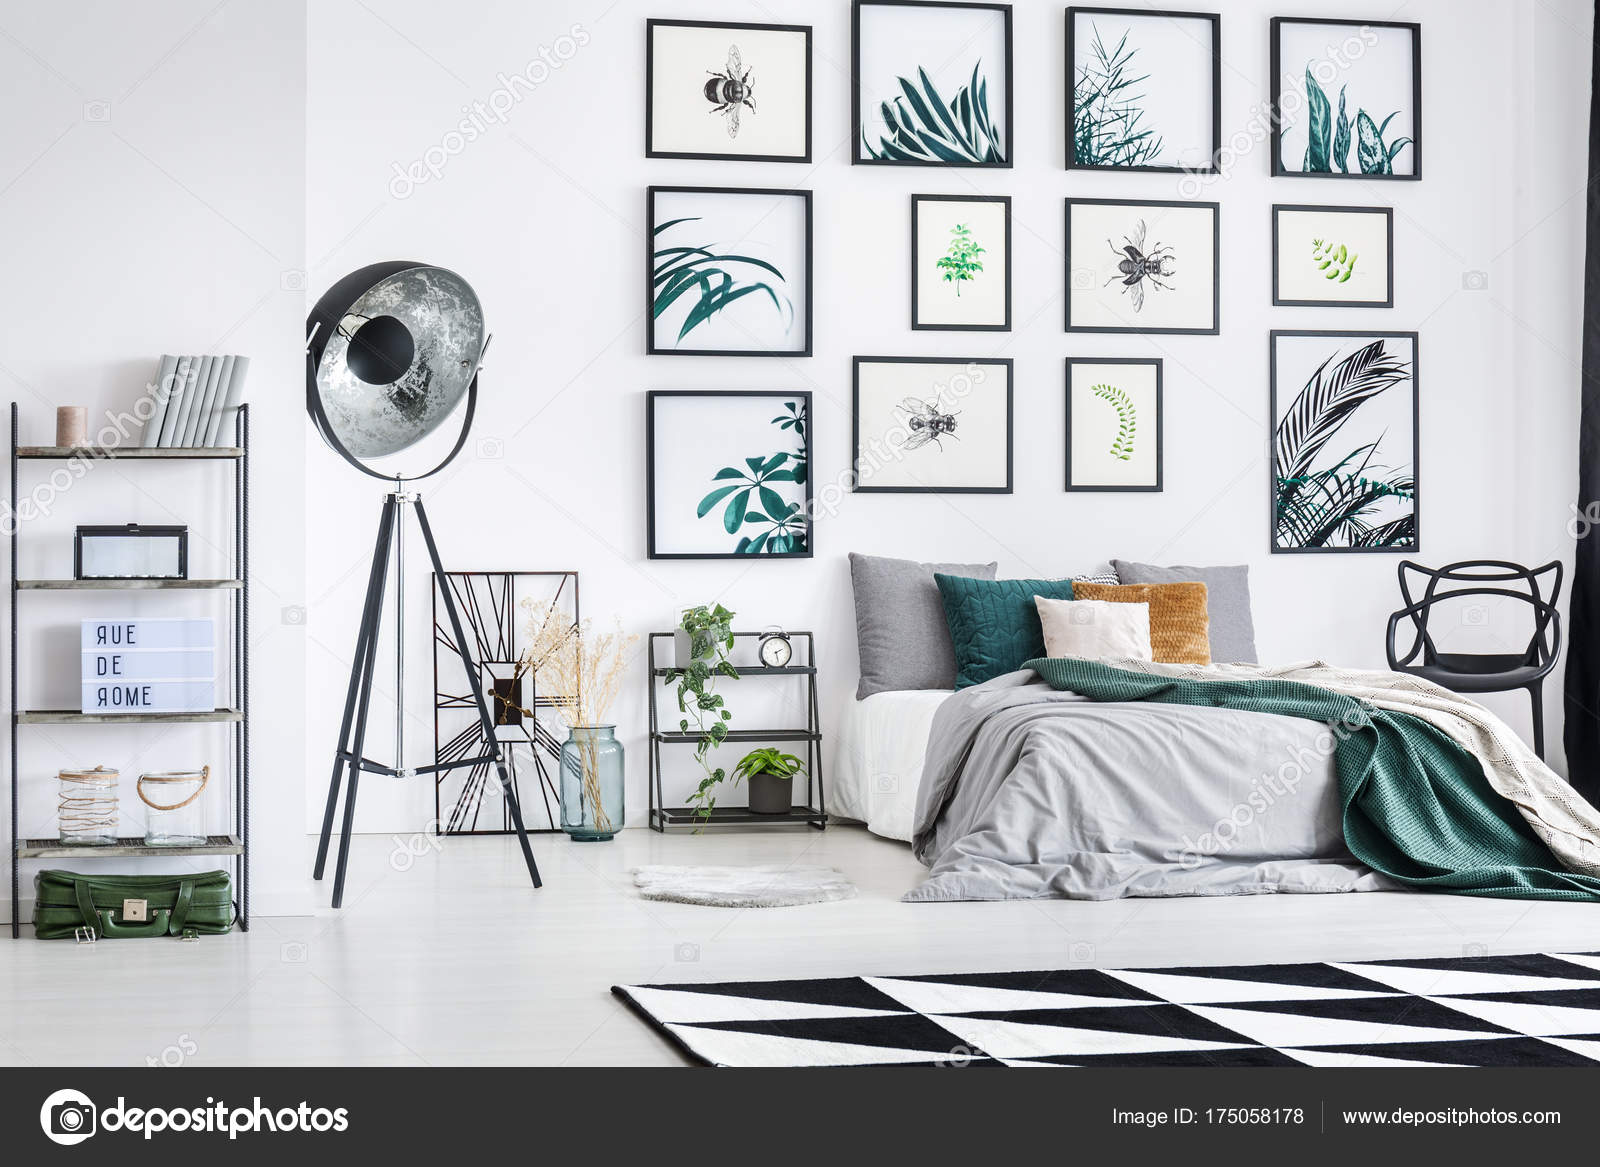 Industrielle Lampe In Modernen Schlafzimmer Stockfoto